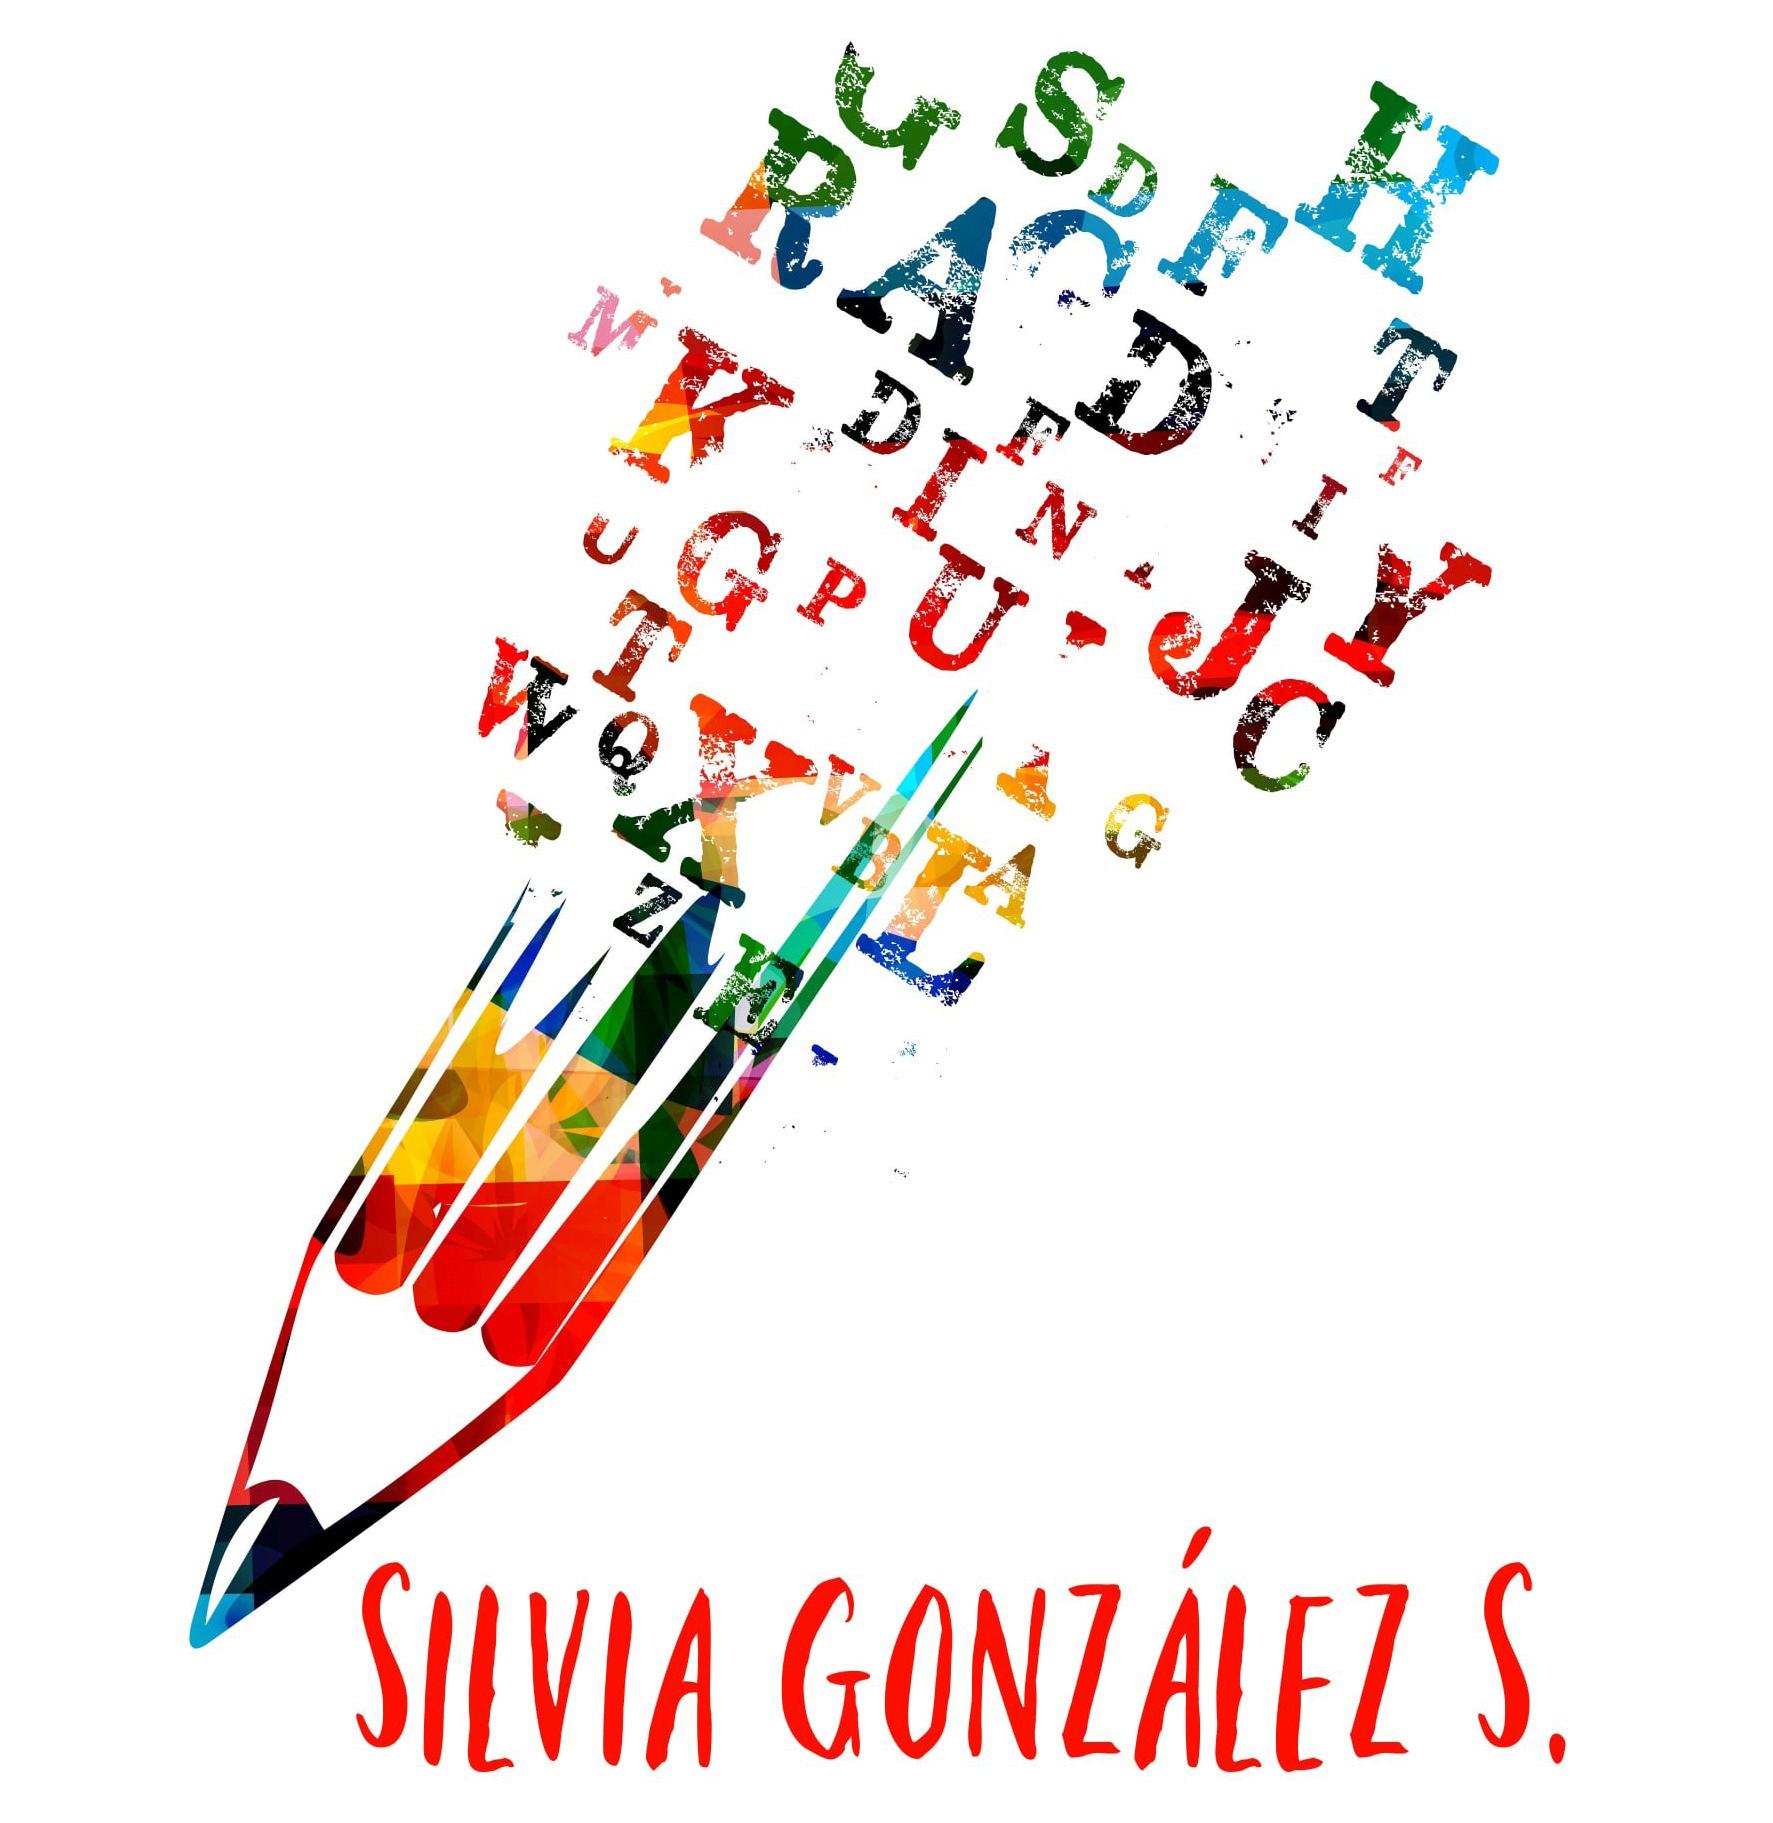 Silvia Gonzalez S.